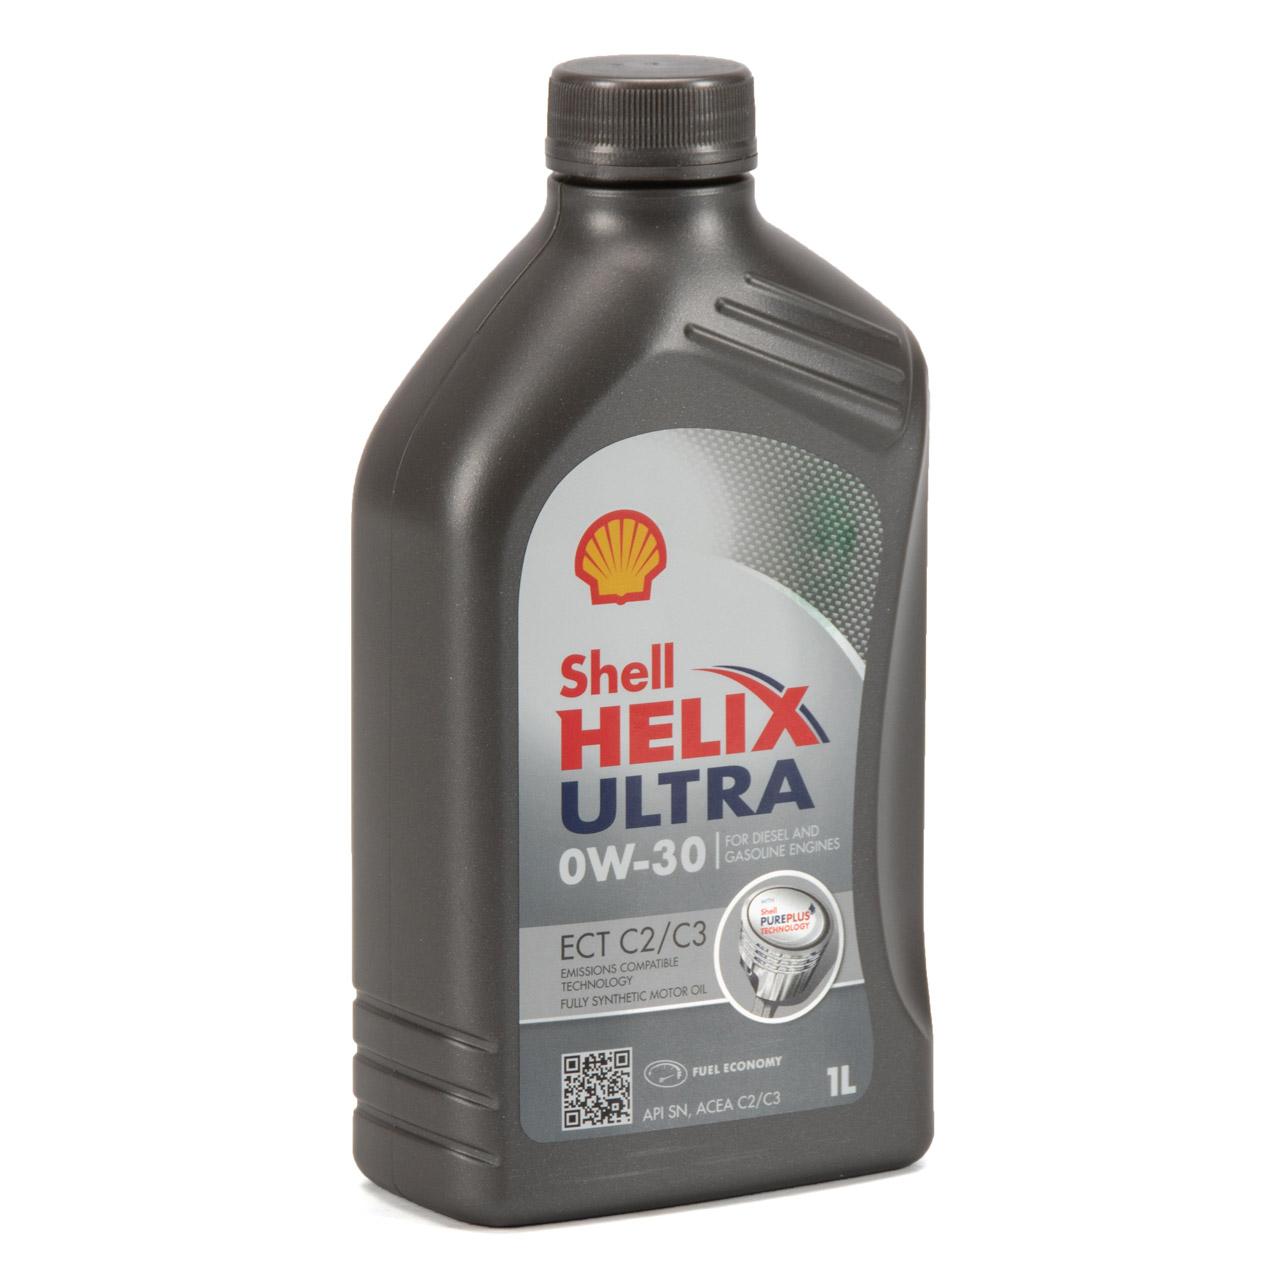 SHELL Motoröl Öl HELIX ULTRA ECT C2/C3 0W30 VW 50400/50700 MB 229.52 - 7 Liter